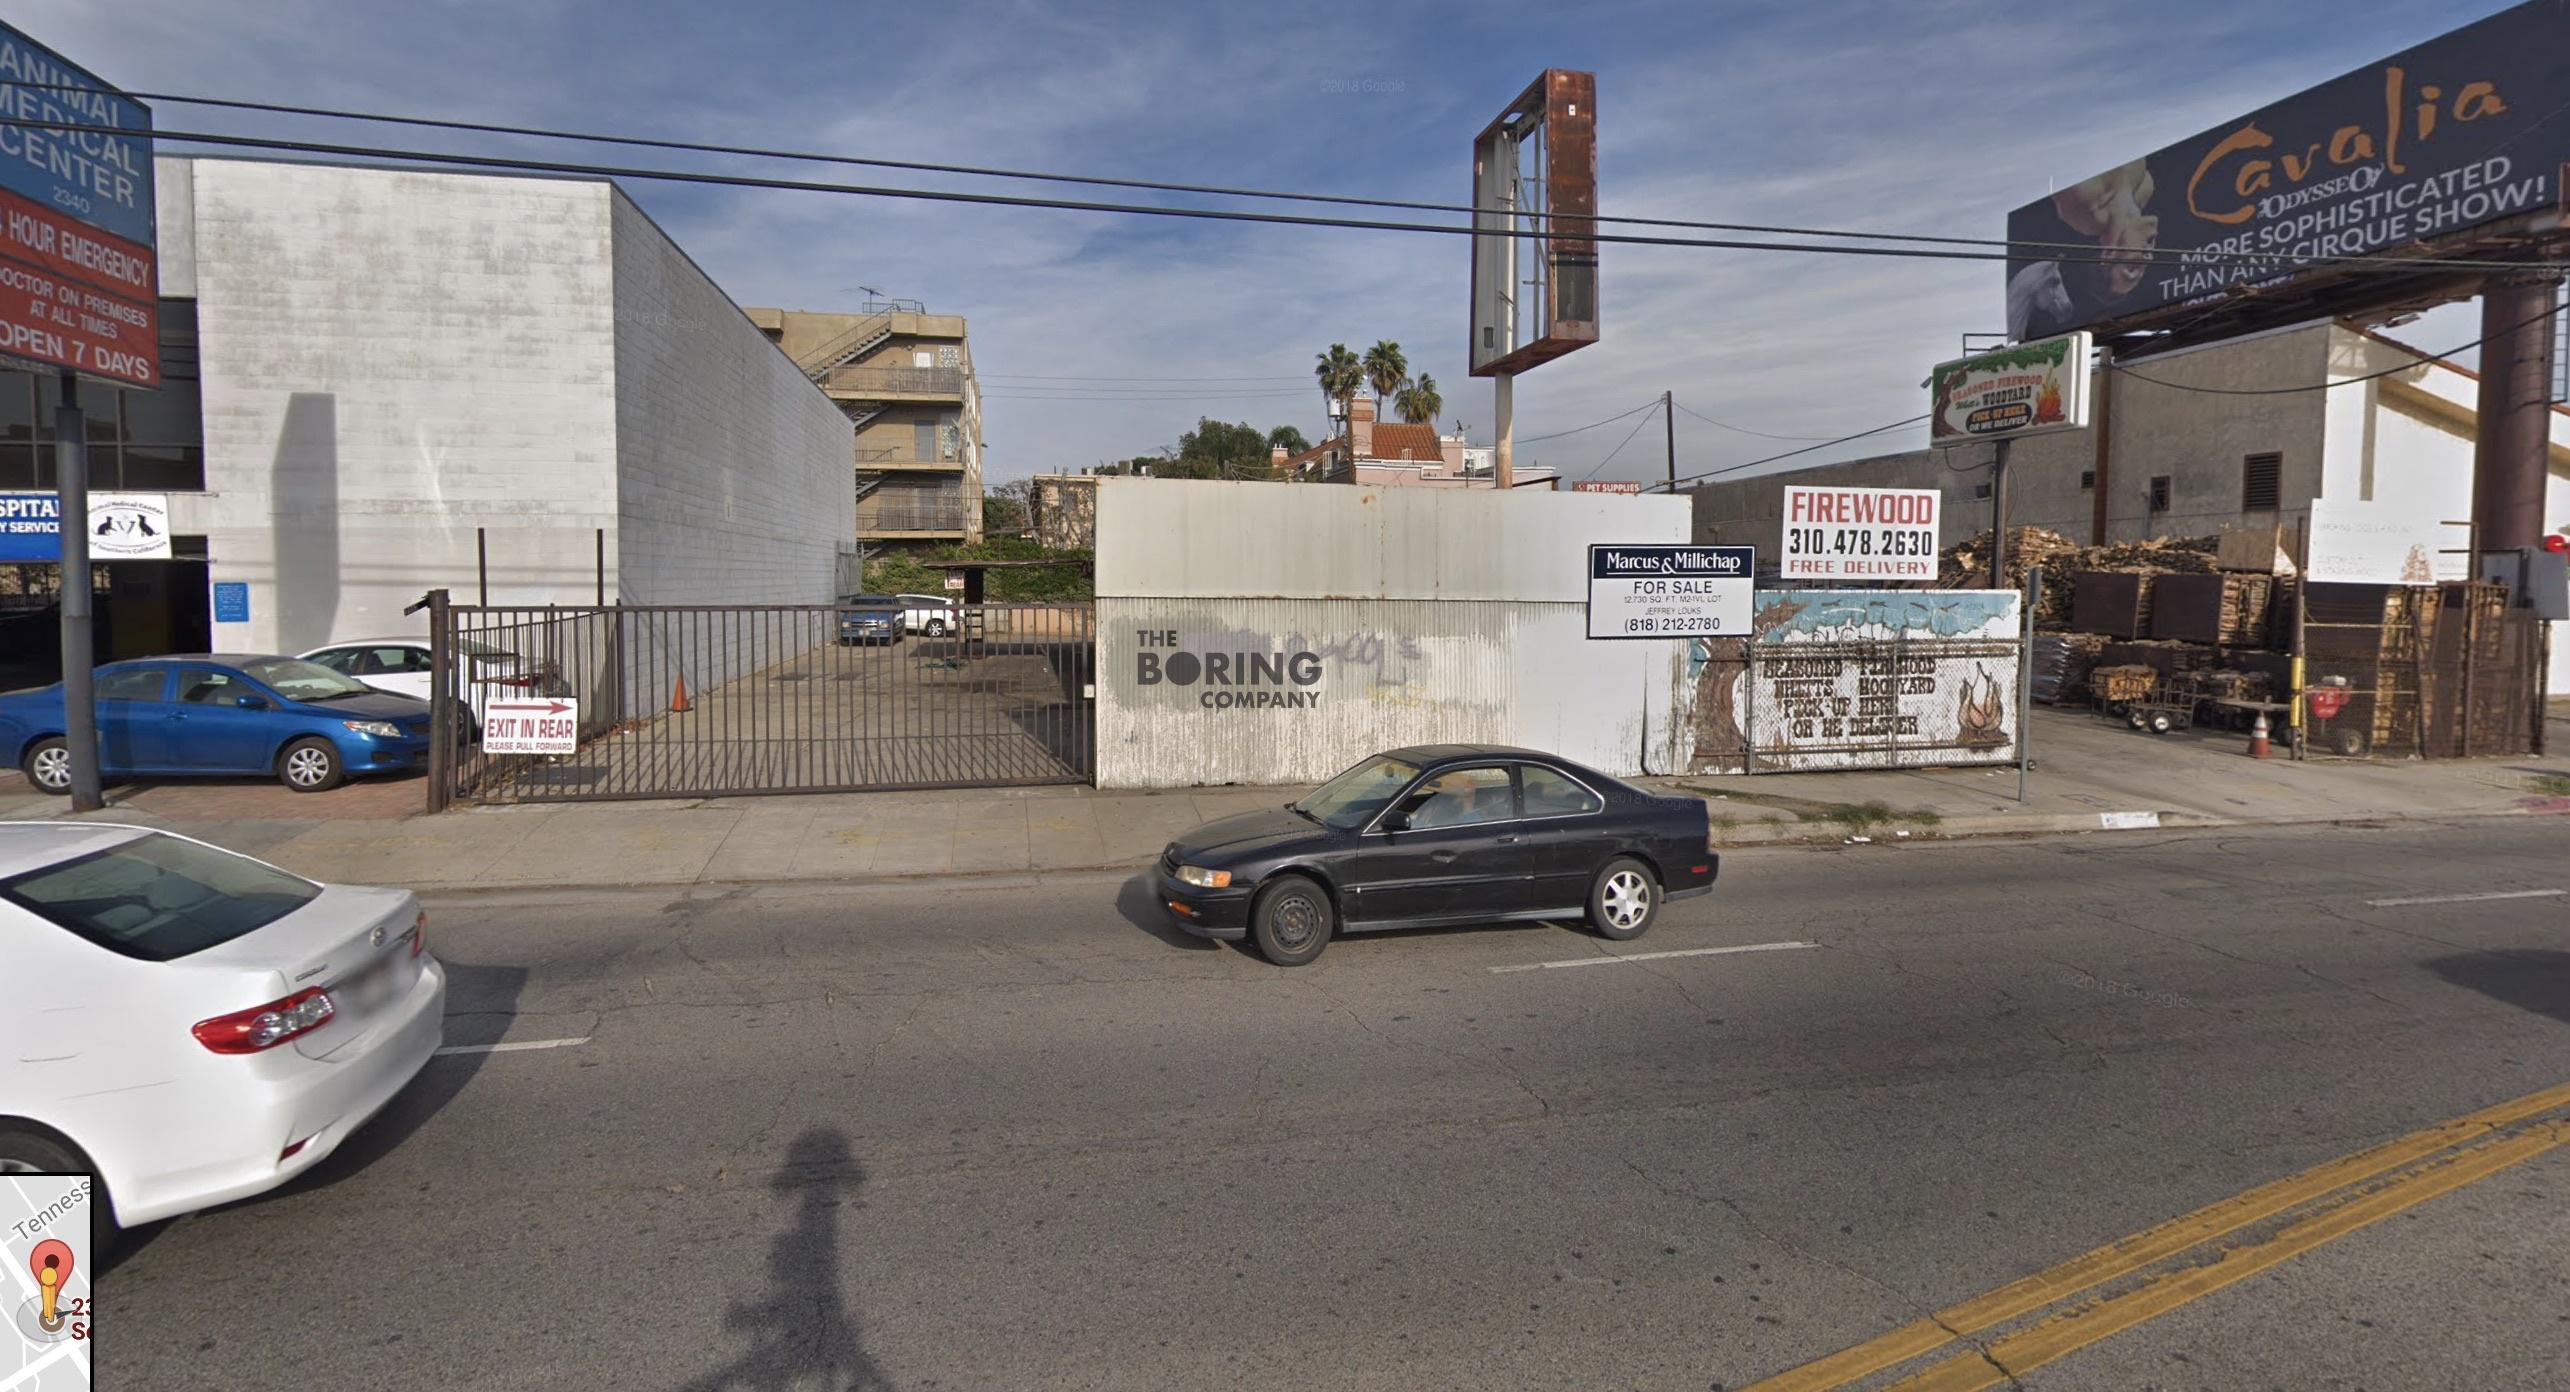 The Boring Company West LA pod station